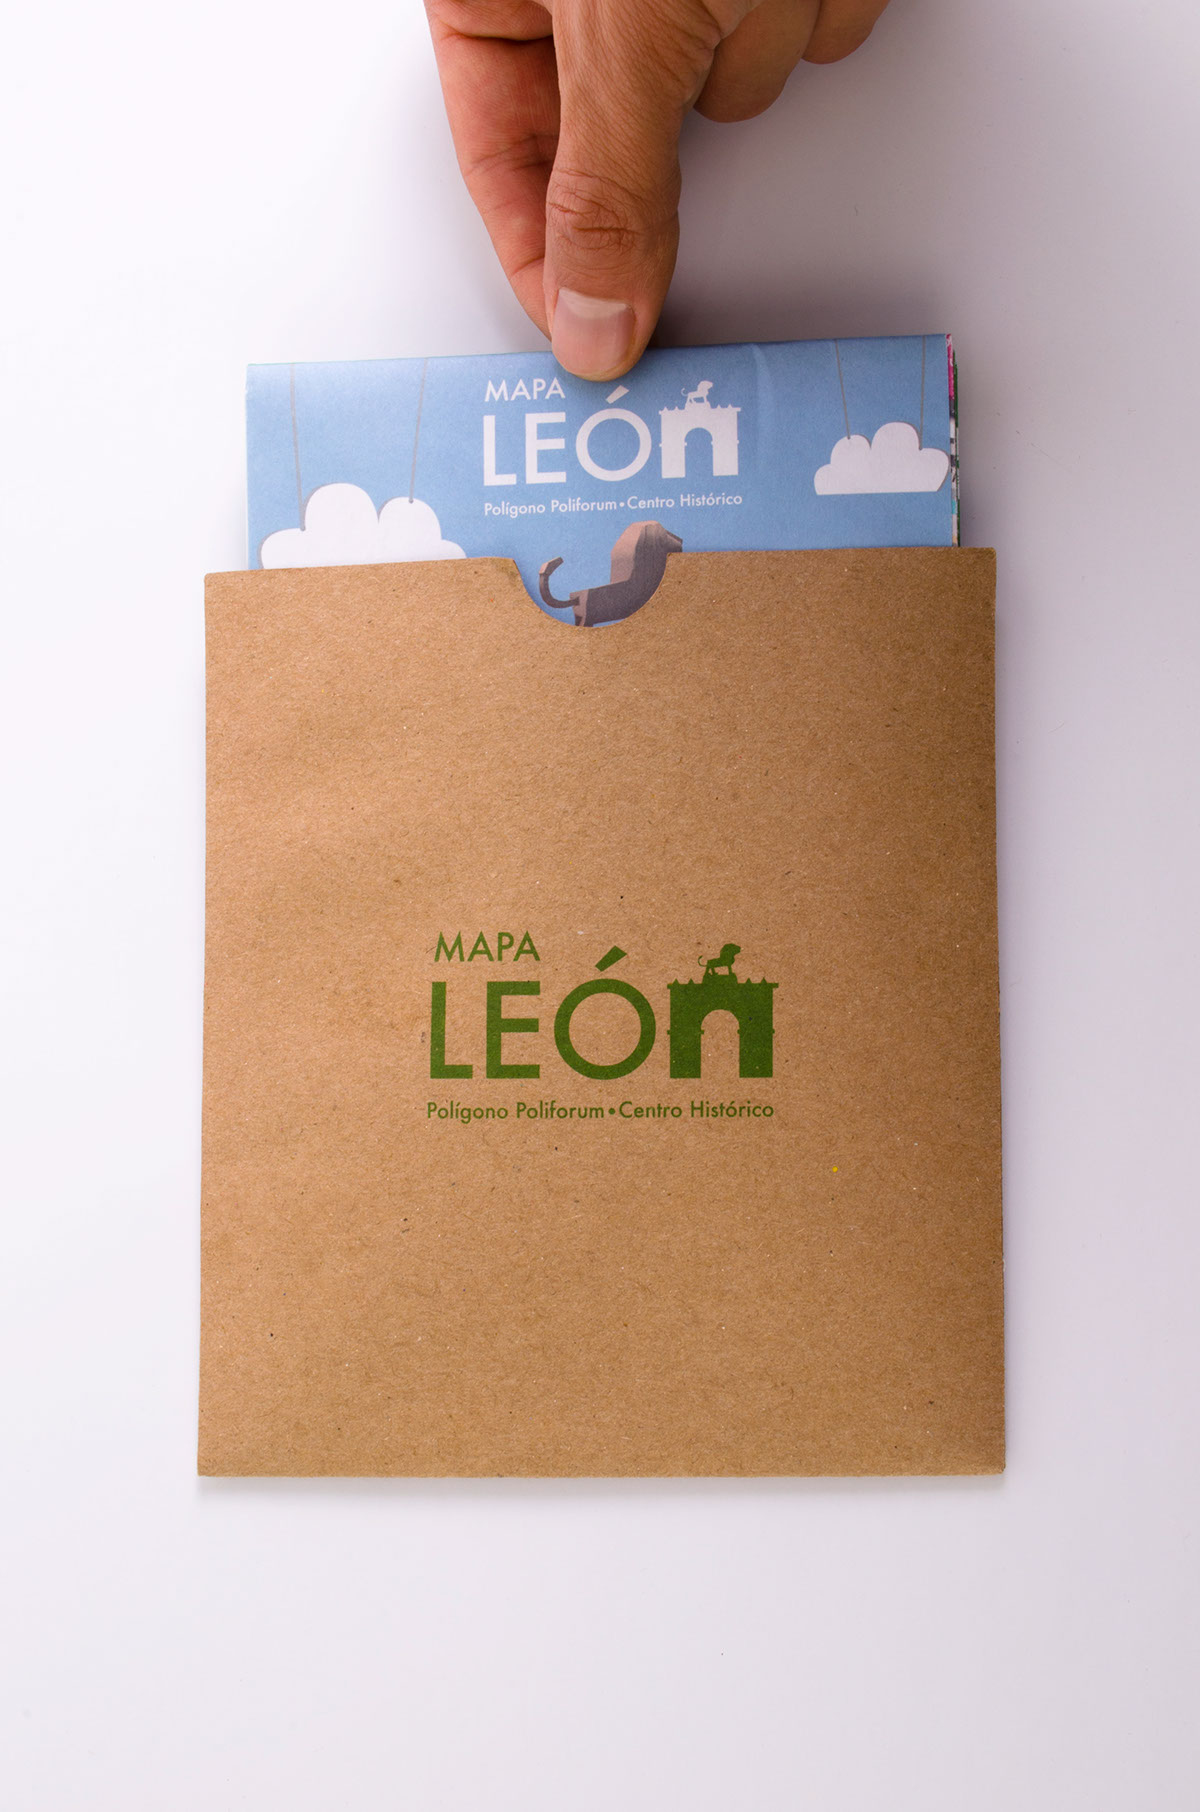 mapa,Leon,centro,historico,forum,poliforum,feria león,centro histórico,León Guanajuato,pimienta creativa,Mapa Centro Histórico,Mapa León